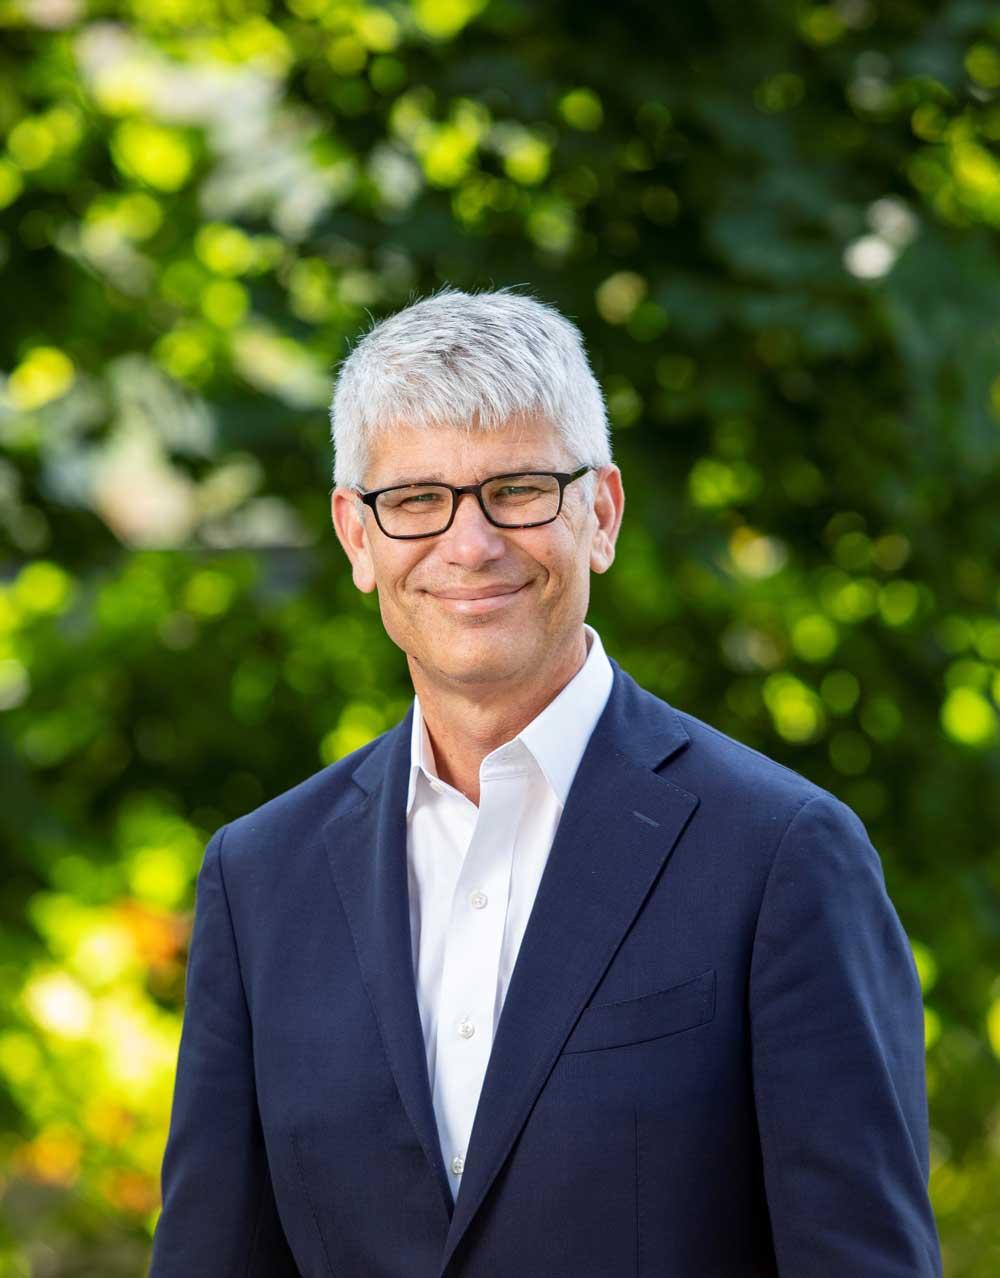 Chris Forman CEO Appcast